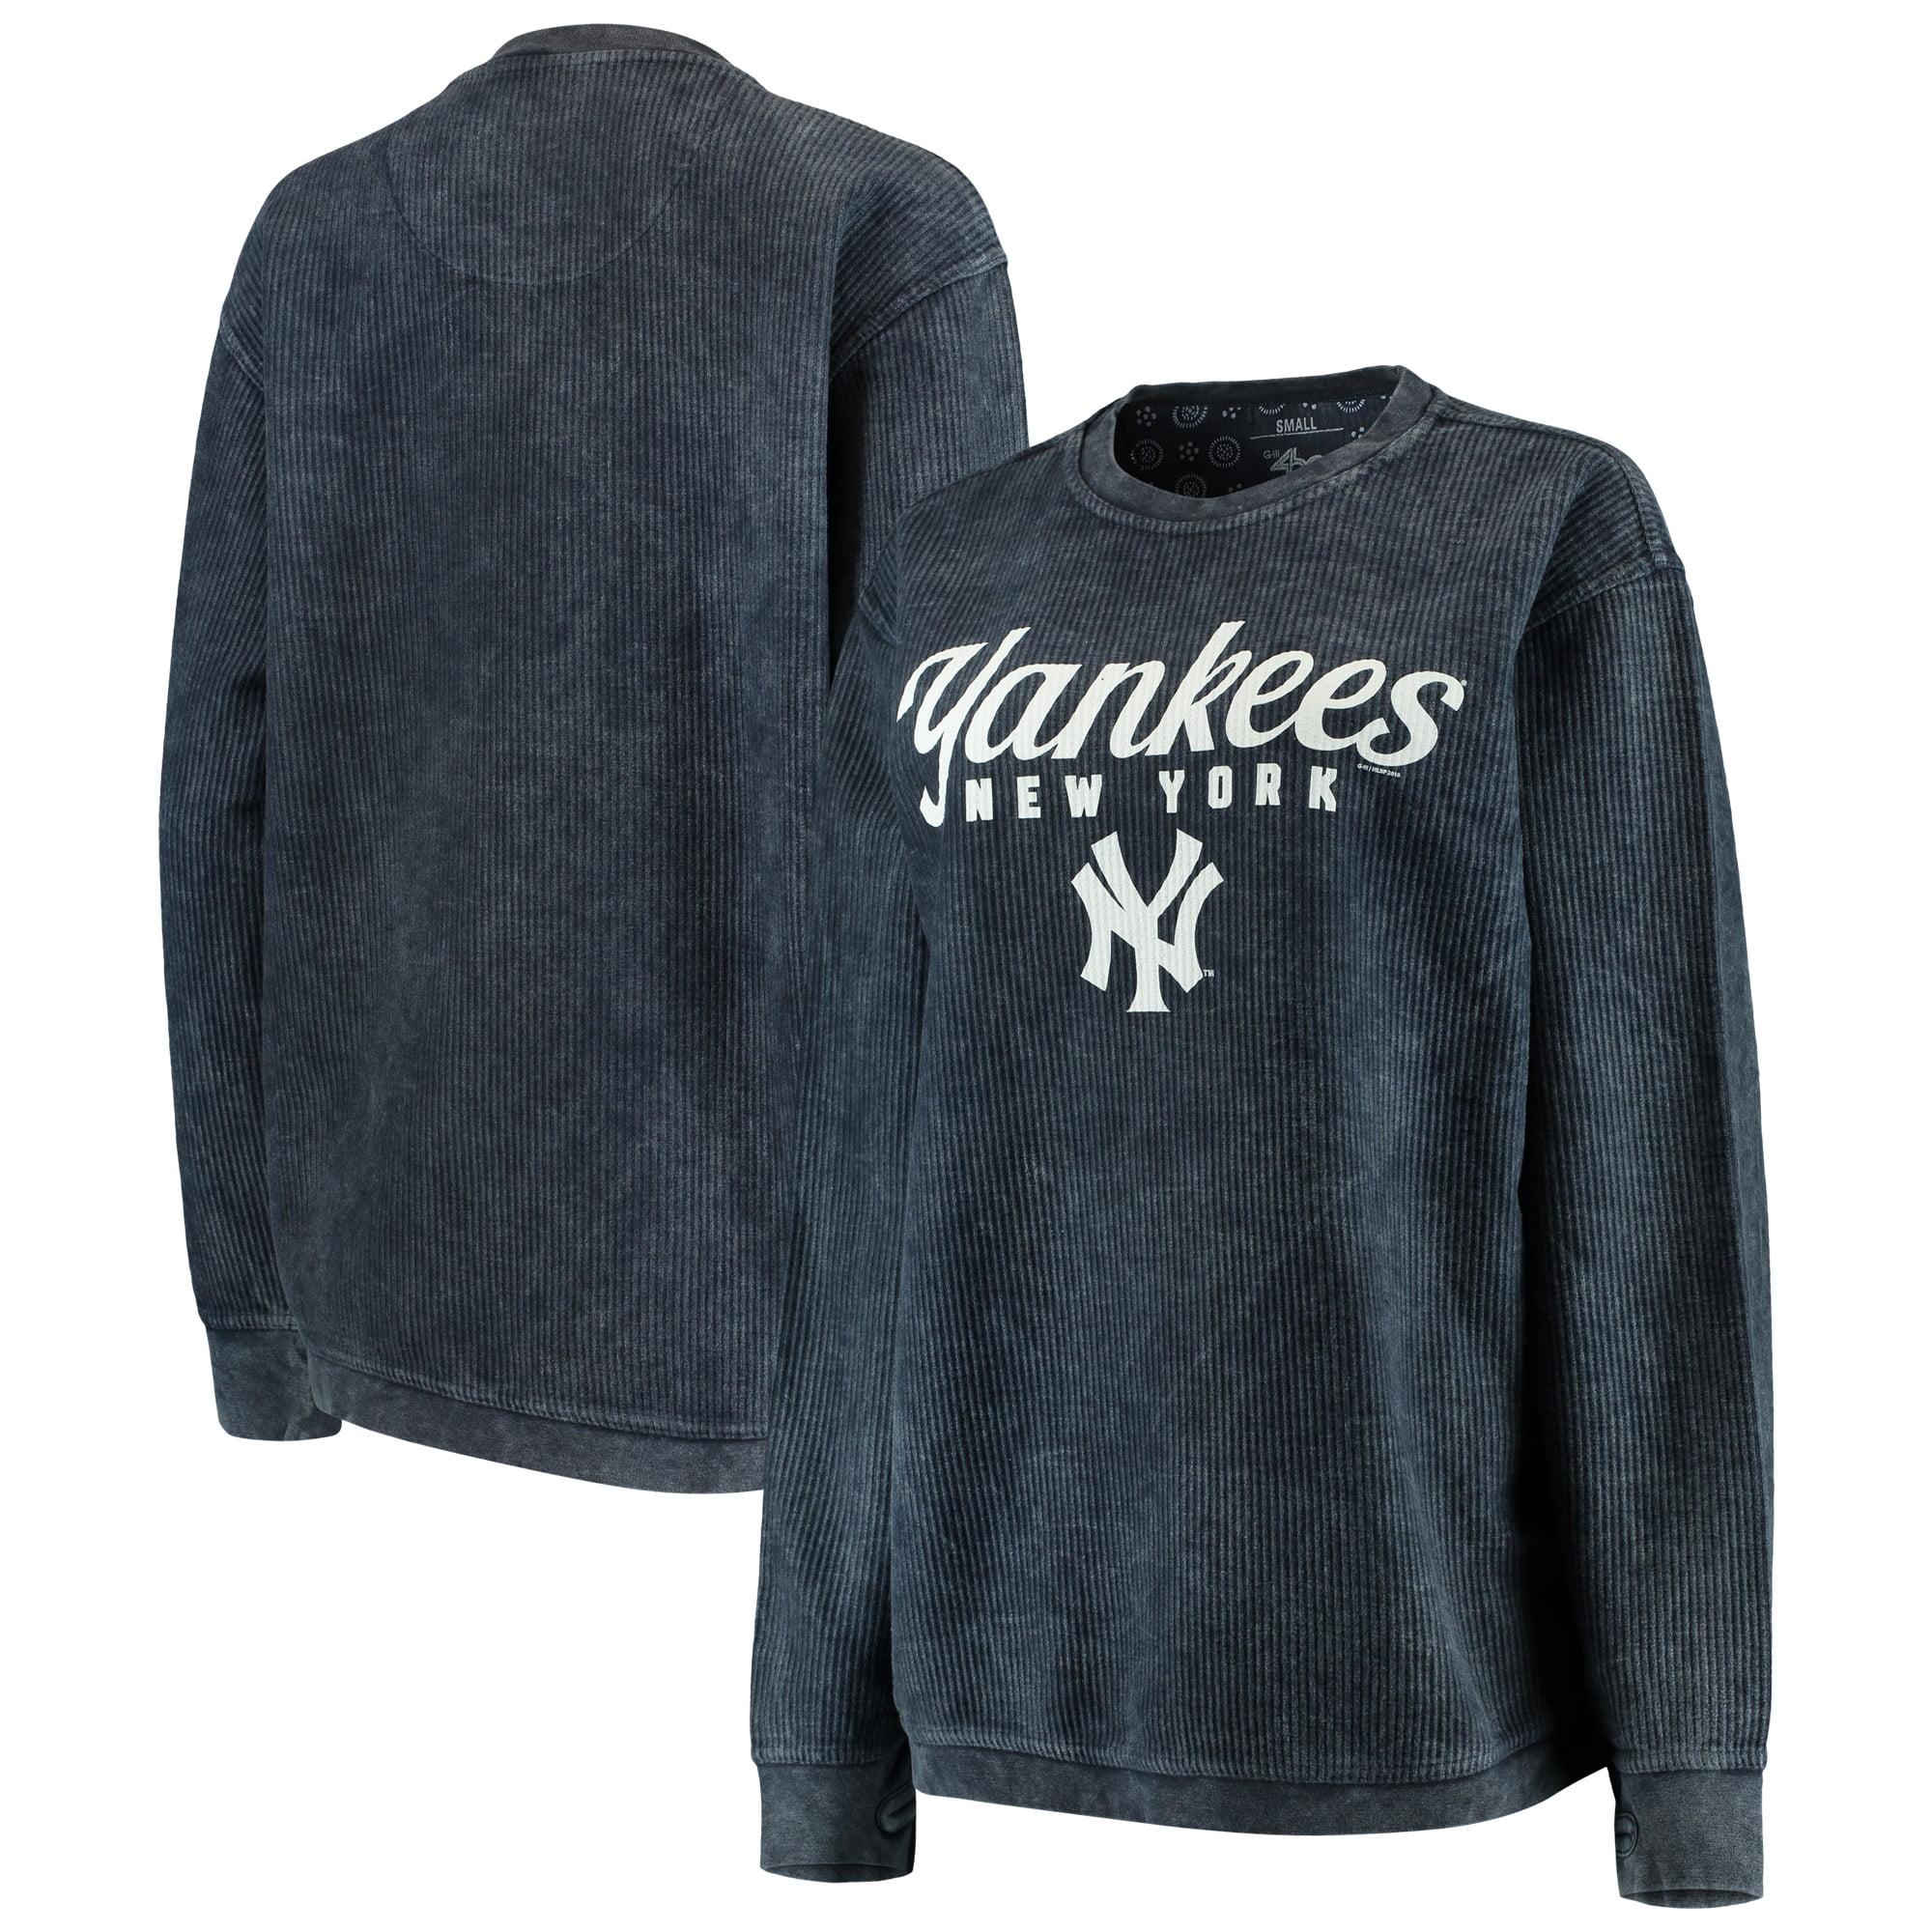 New York Yankees G-III 4Her by Carl Banks Women's Comfy Cord Pullover Sweatshirt - Navy